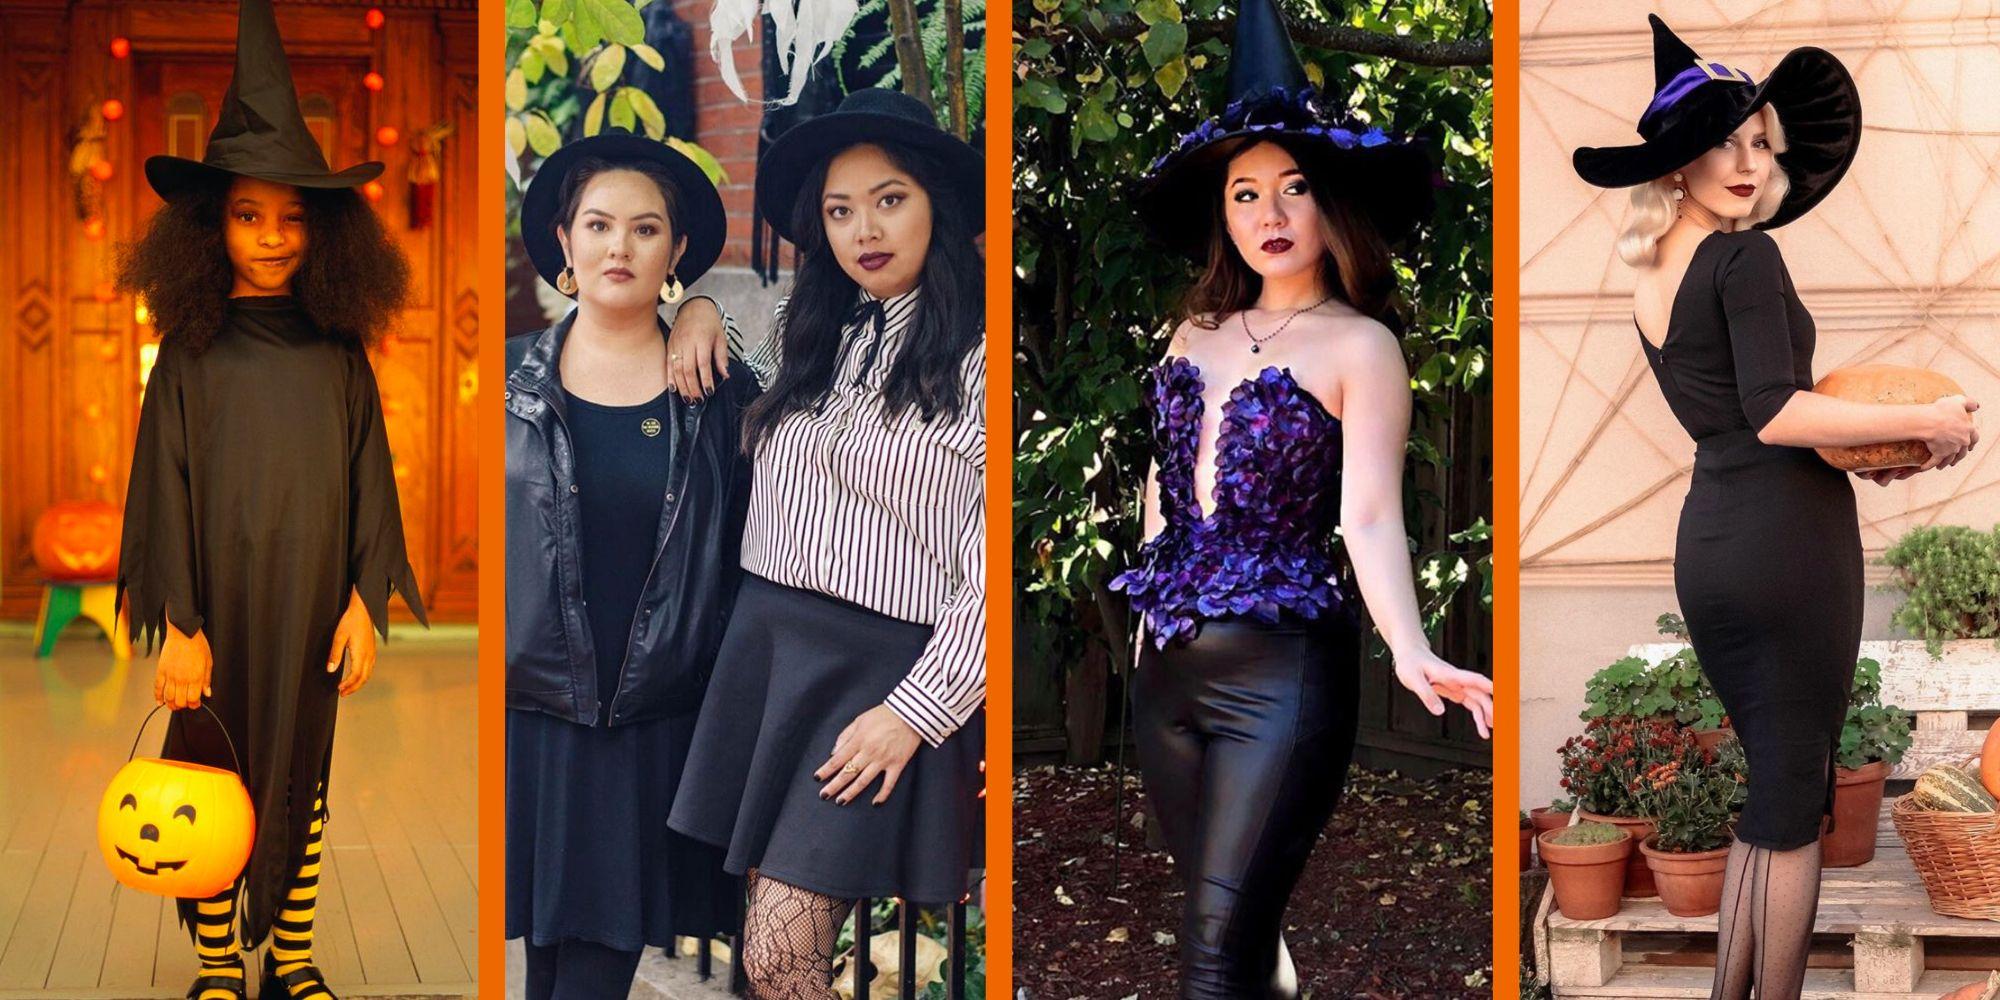 Top 10 Best Classic Halloween Costumes Ideas